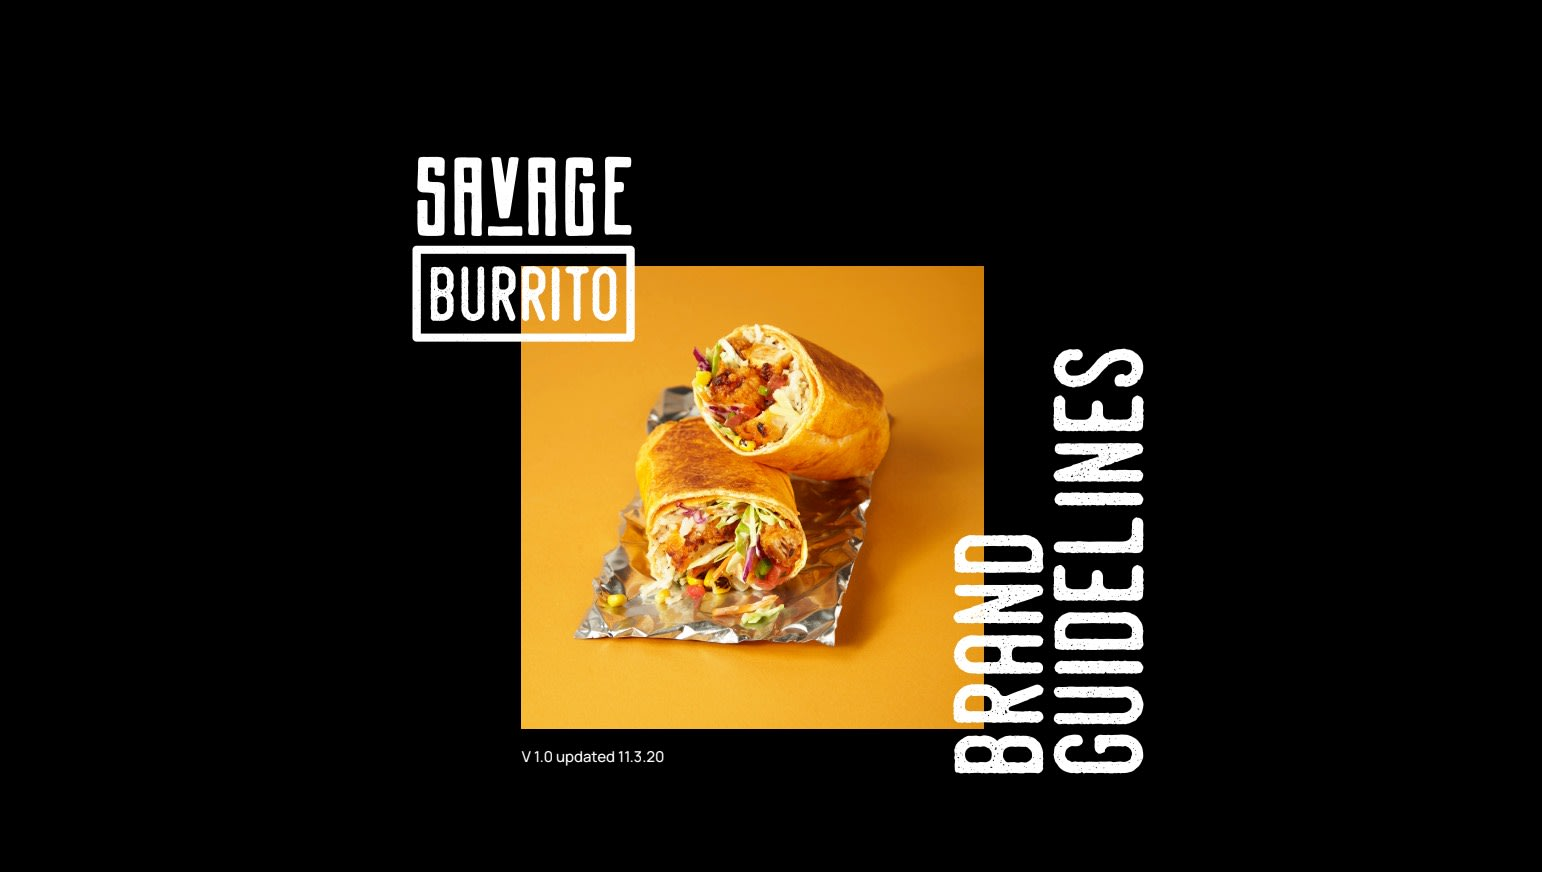 Savage Burrito brand guidelines.